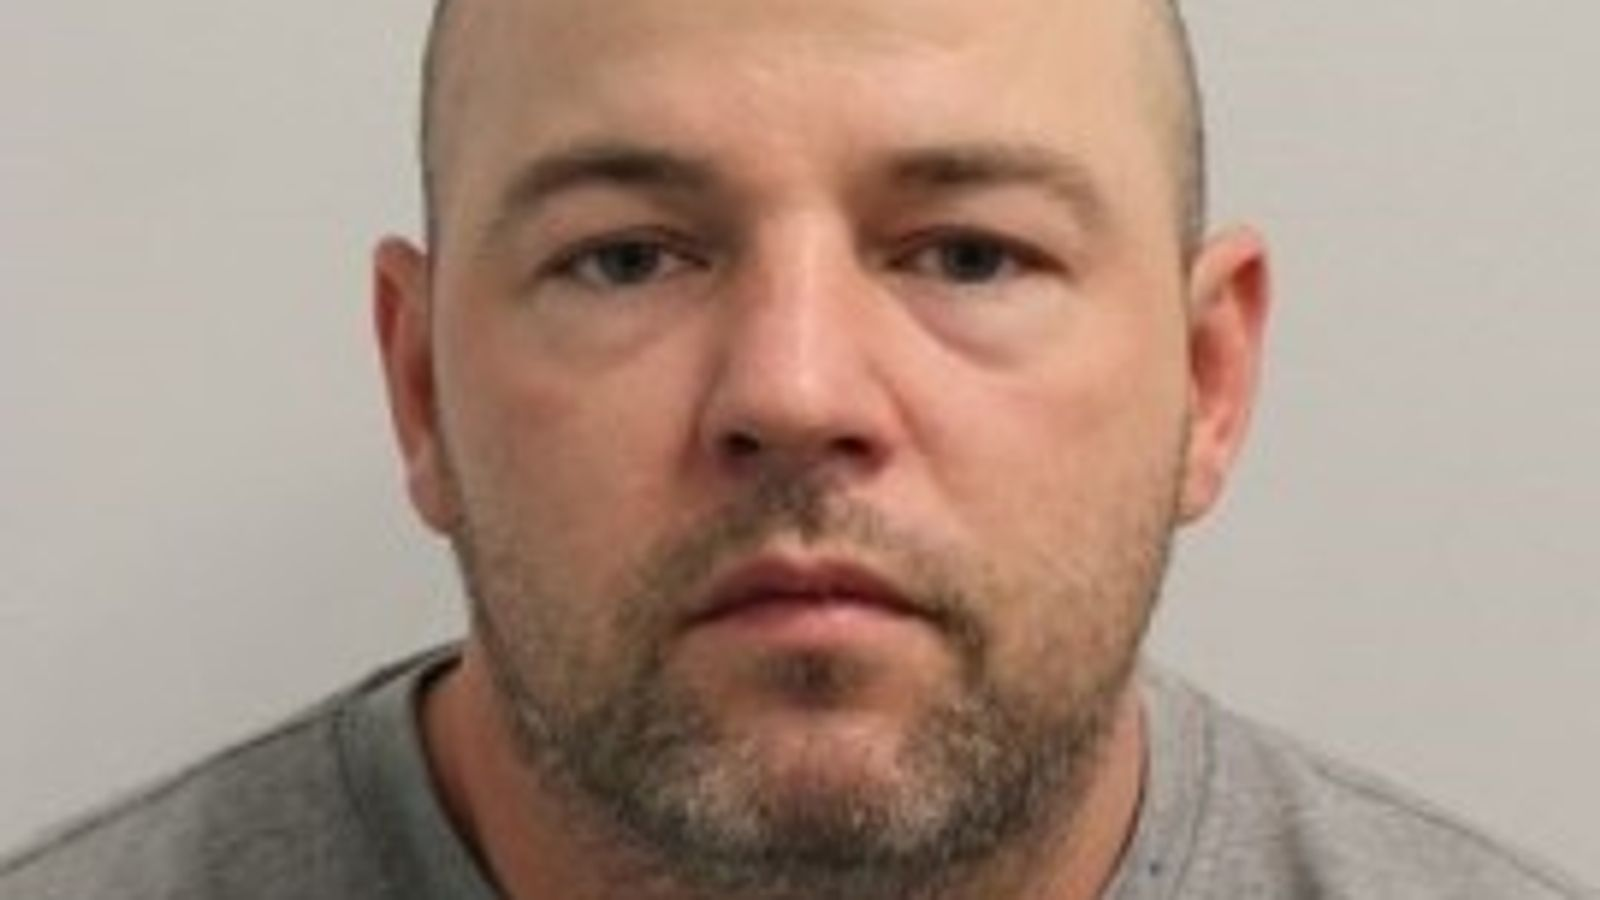 Joseph McCann: Serial rapist gets 33 life sentences after series of sex attacks